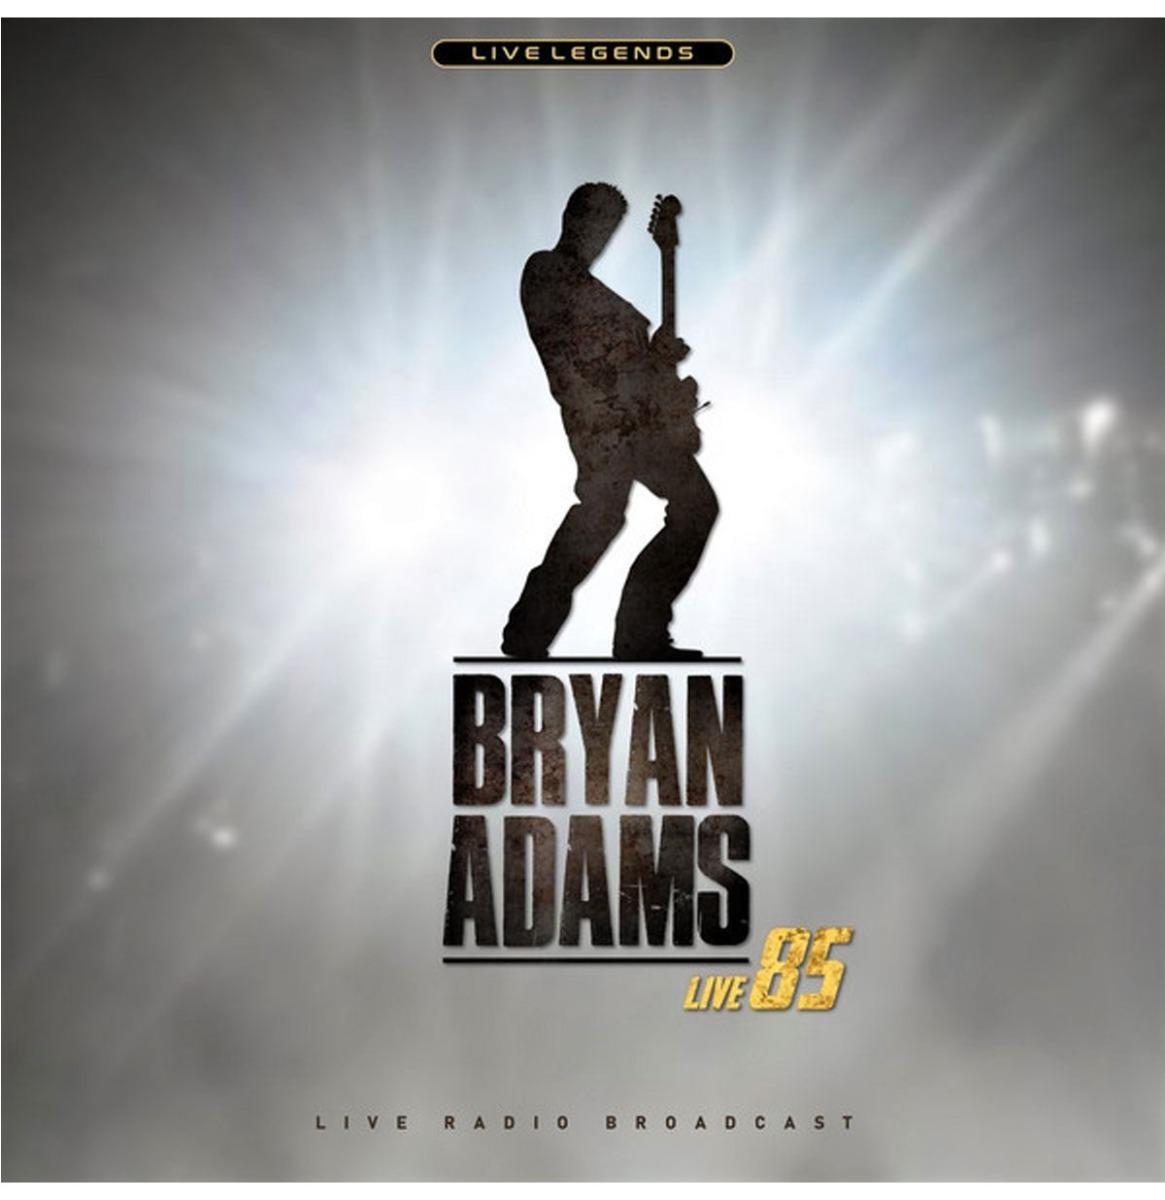 Bryan Adams - Live 85 (Clear Vinyl) LP